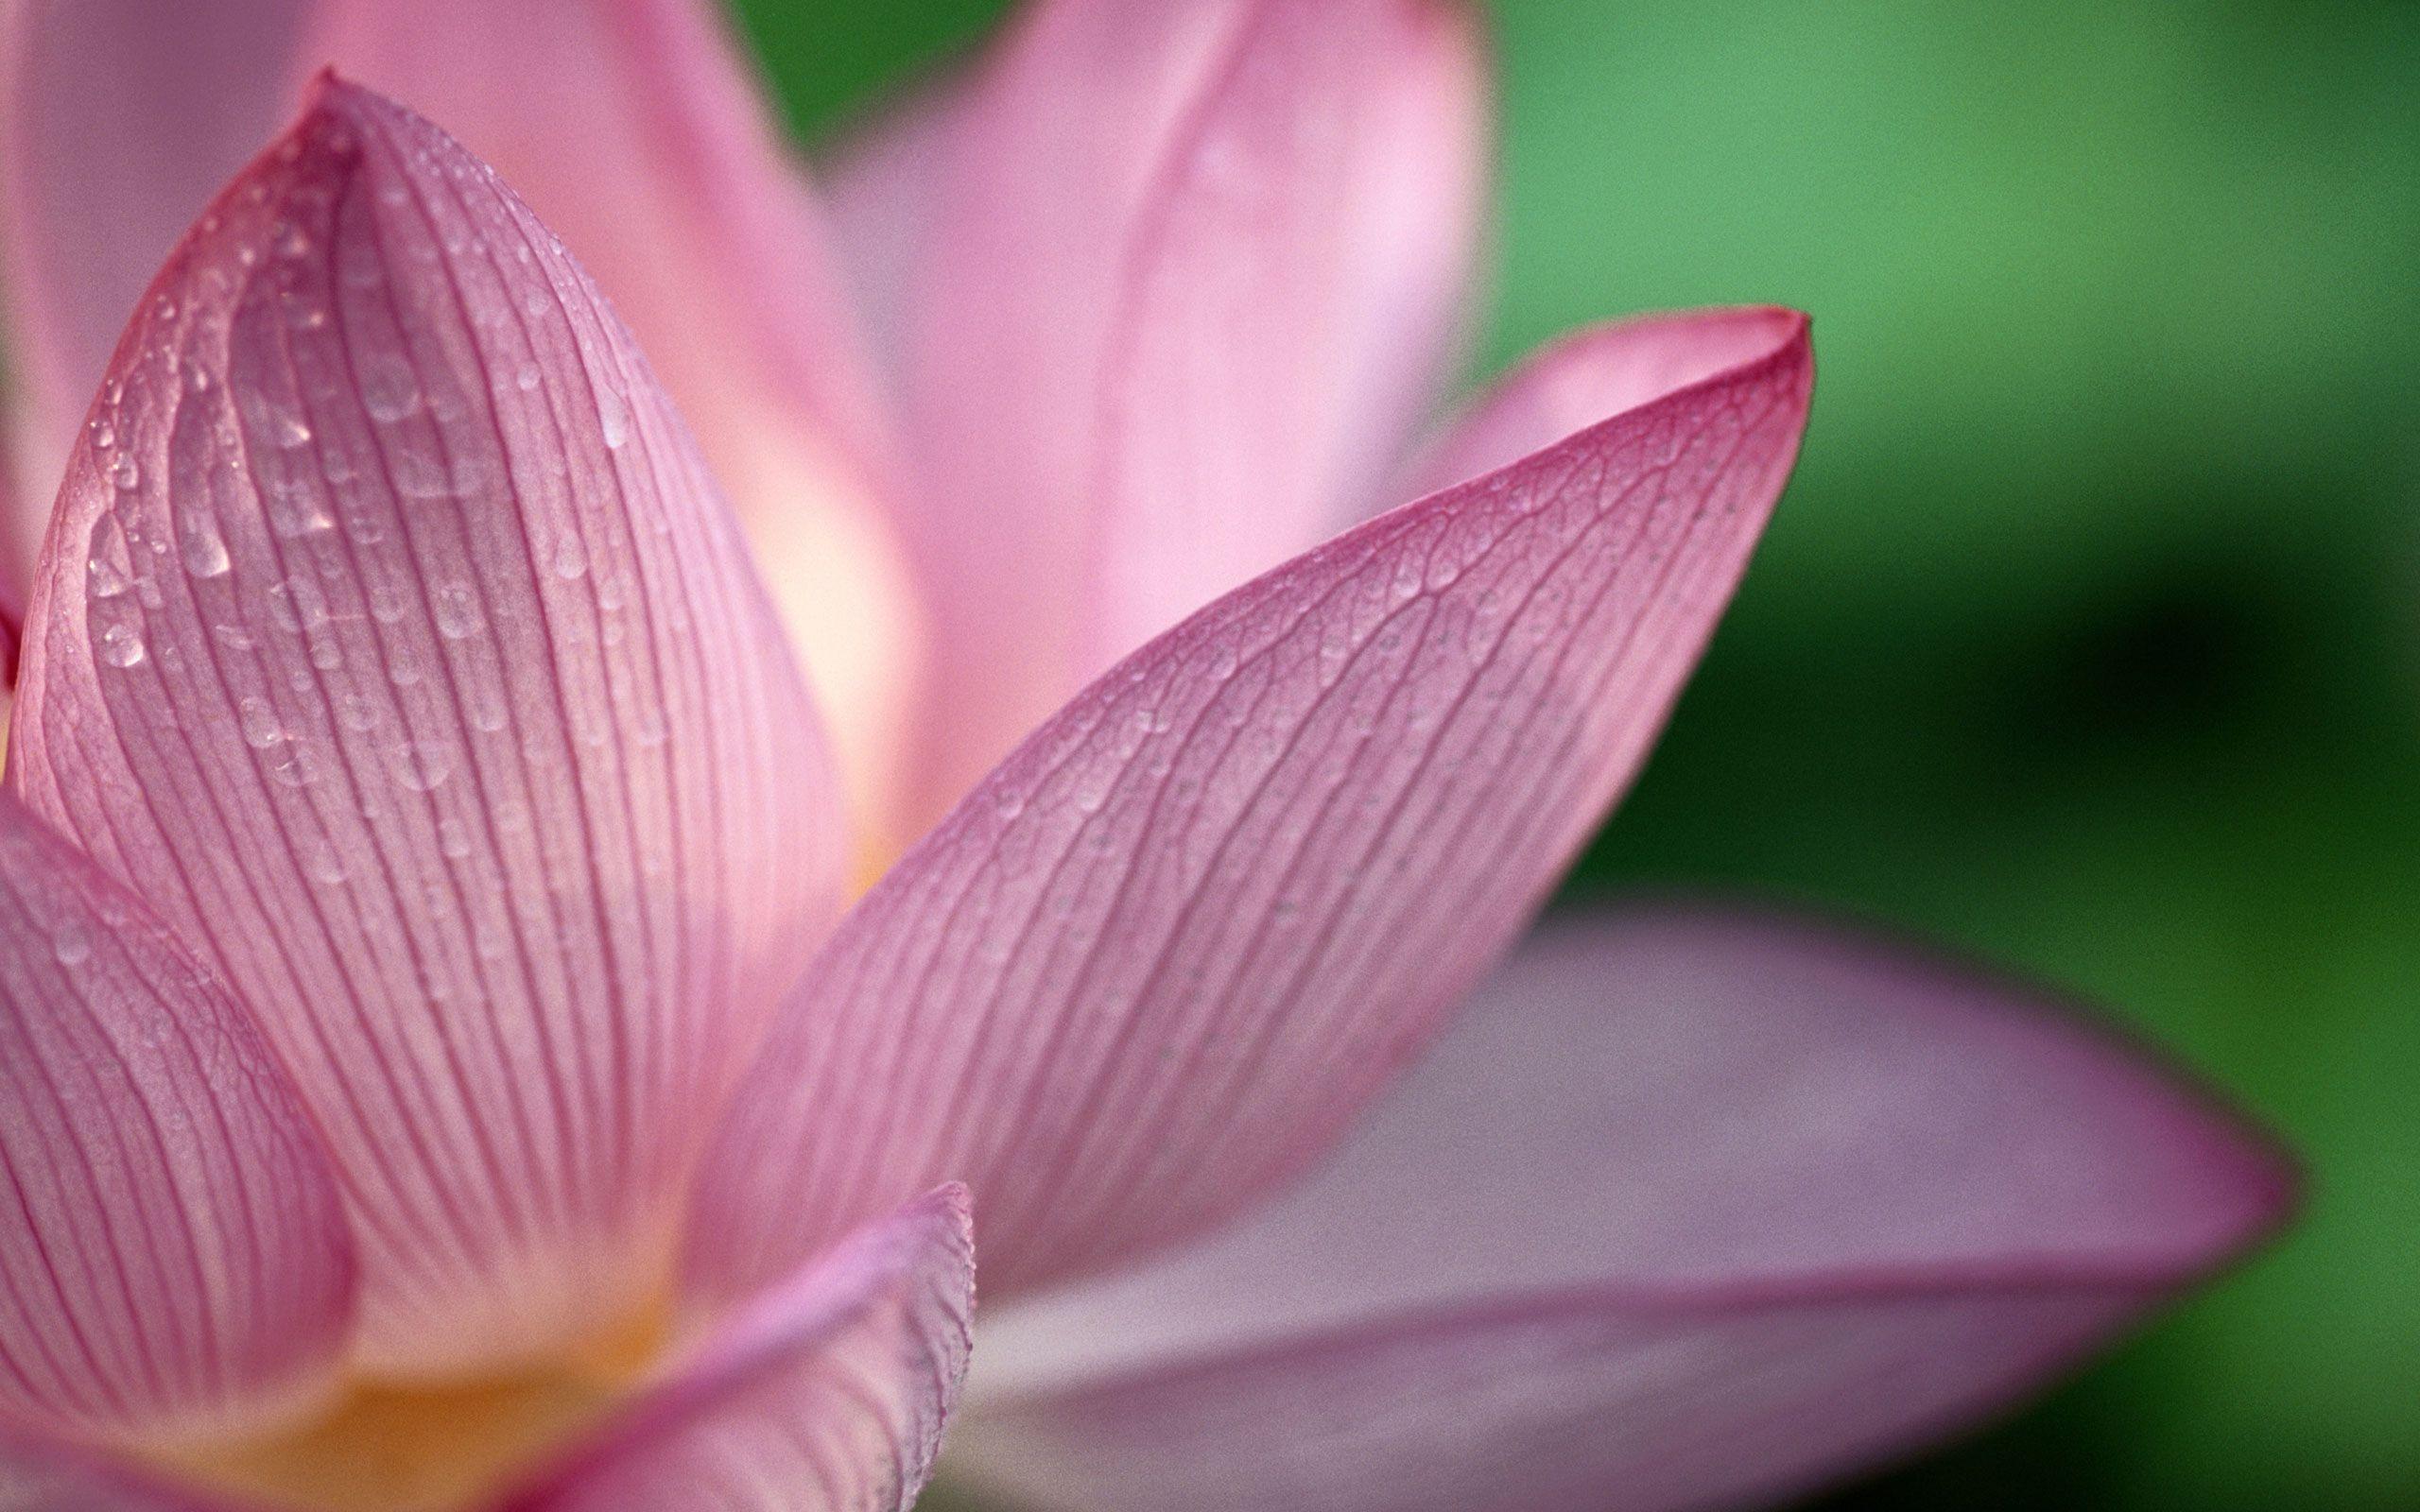 Lotus Flower Desktop Wallpapers | Lotus Flower Pictures | Cool ...